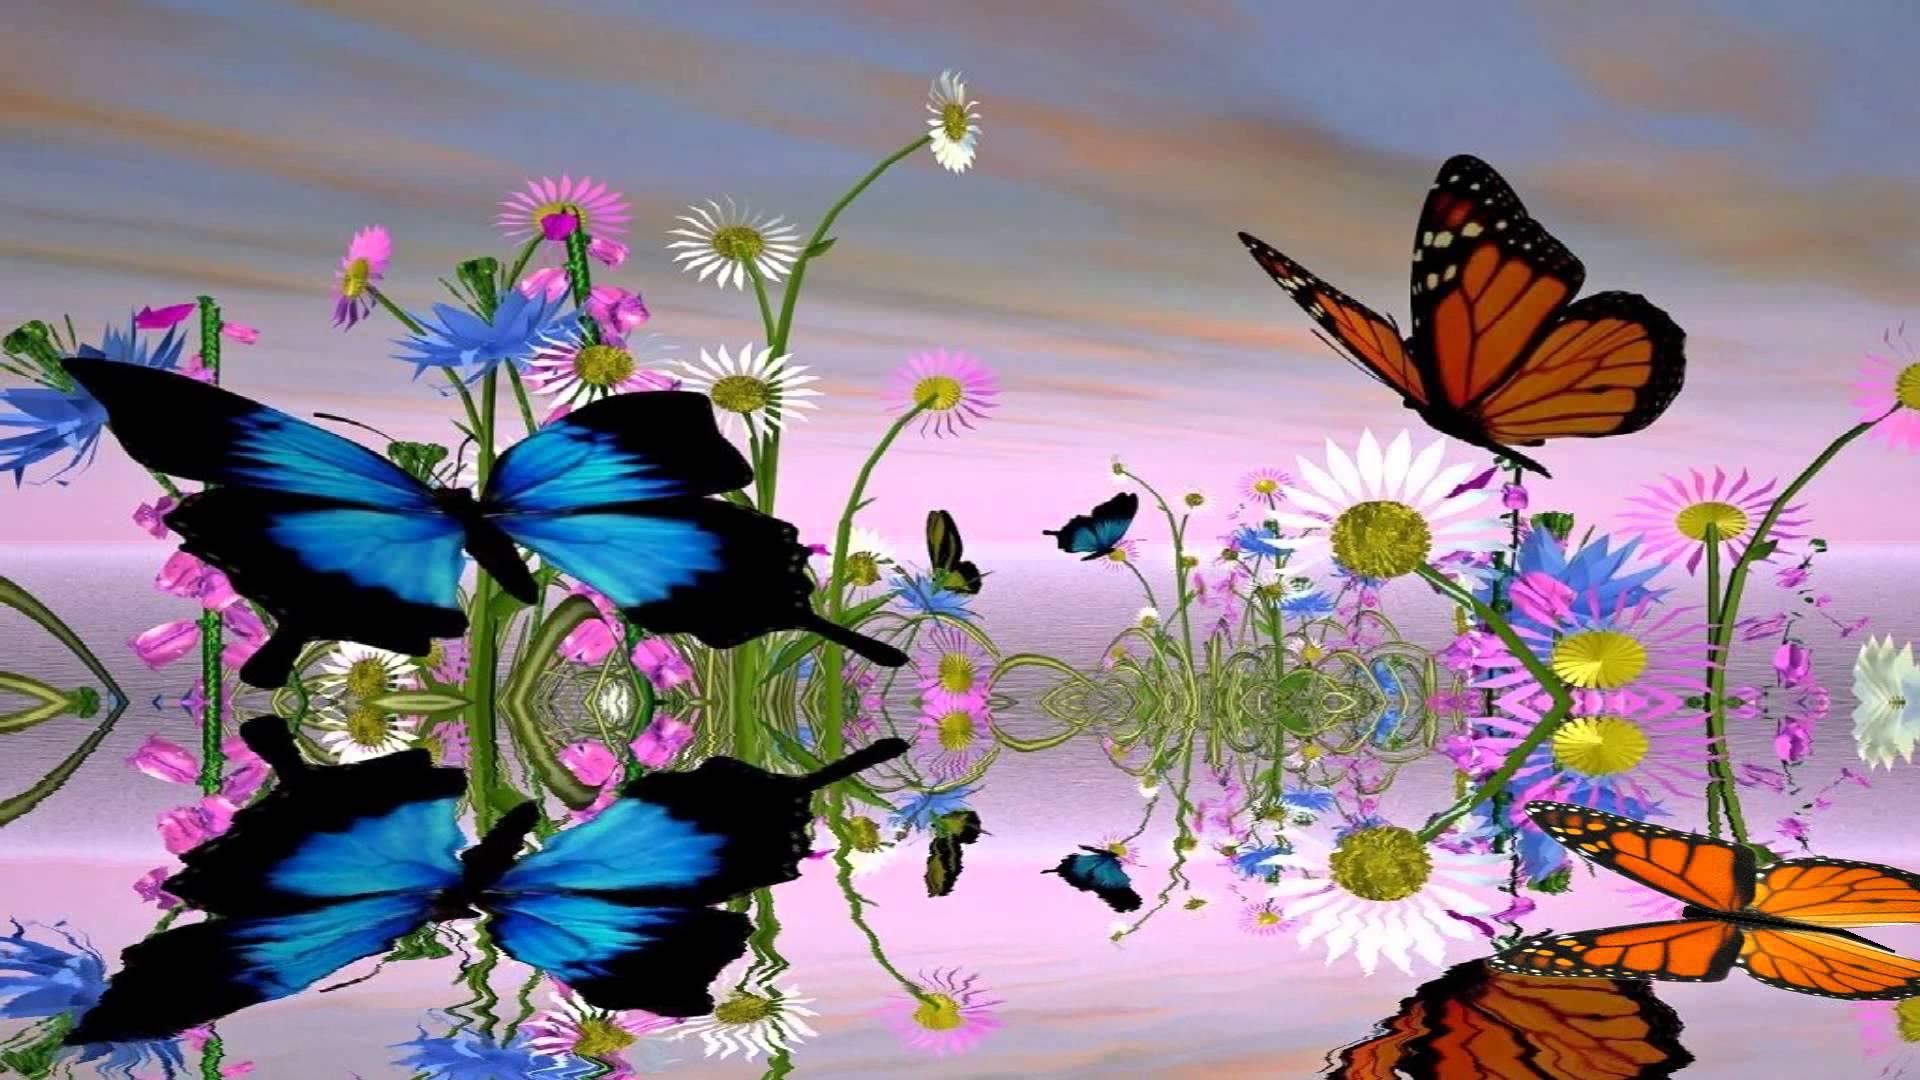 Fantastic Butterfly Screensaver httpwwwscreensavergiftcom 1920x1080